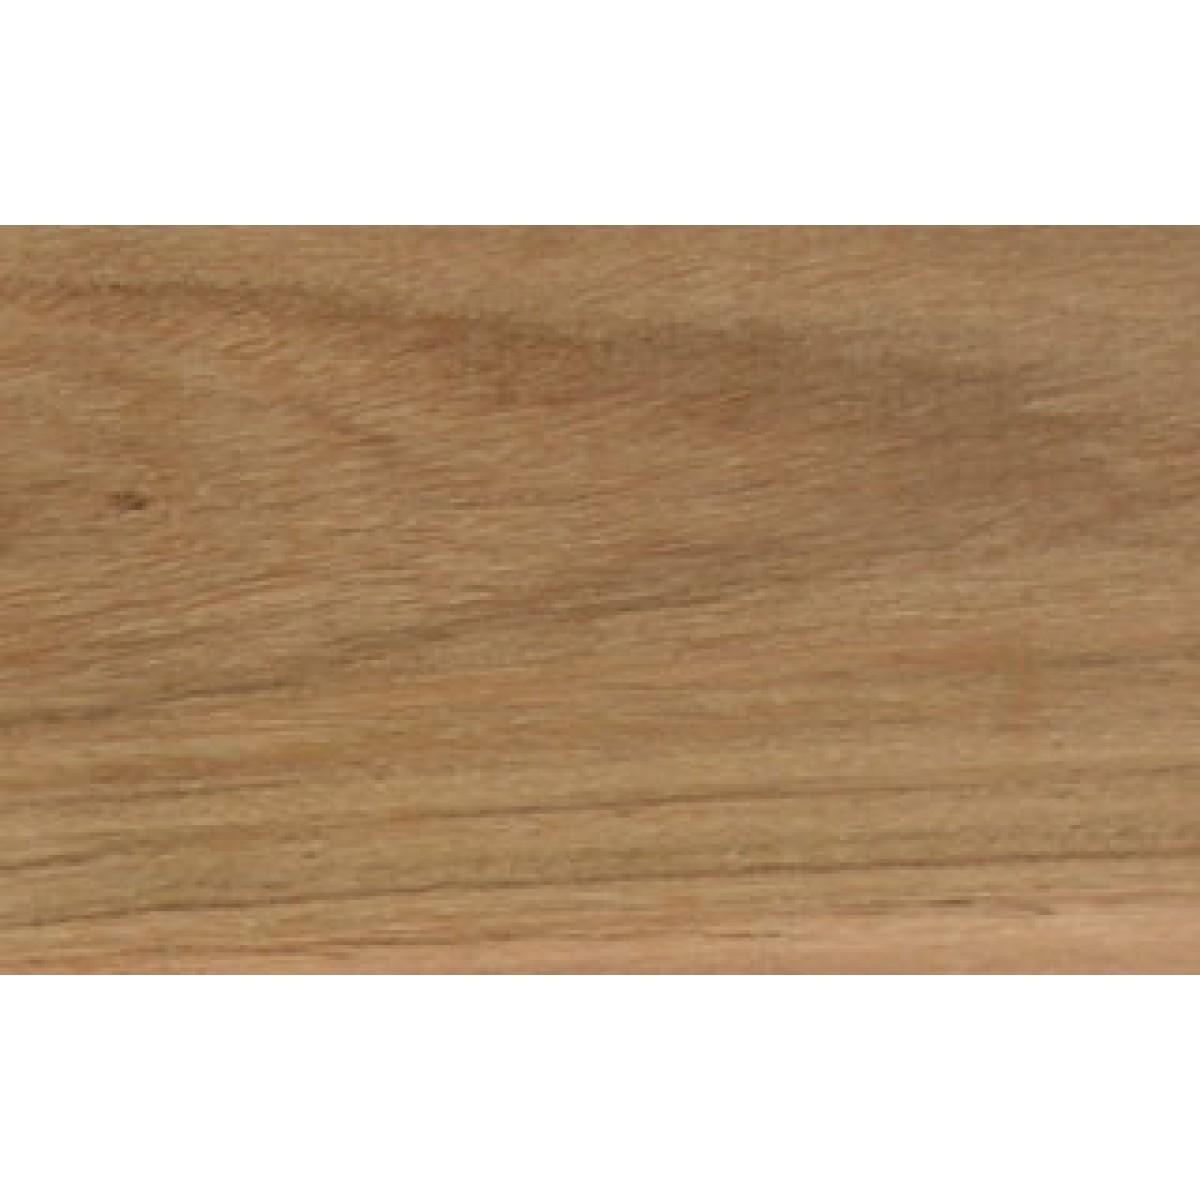 Grey box decking get floors for Australian hardwood decking